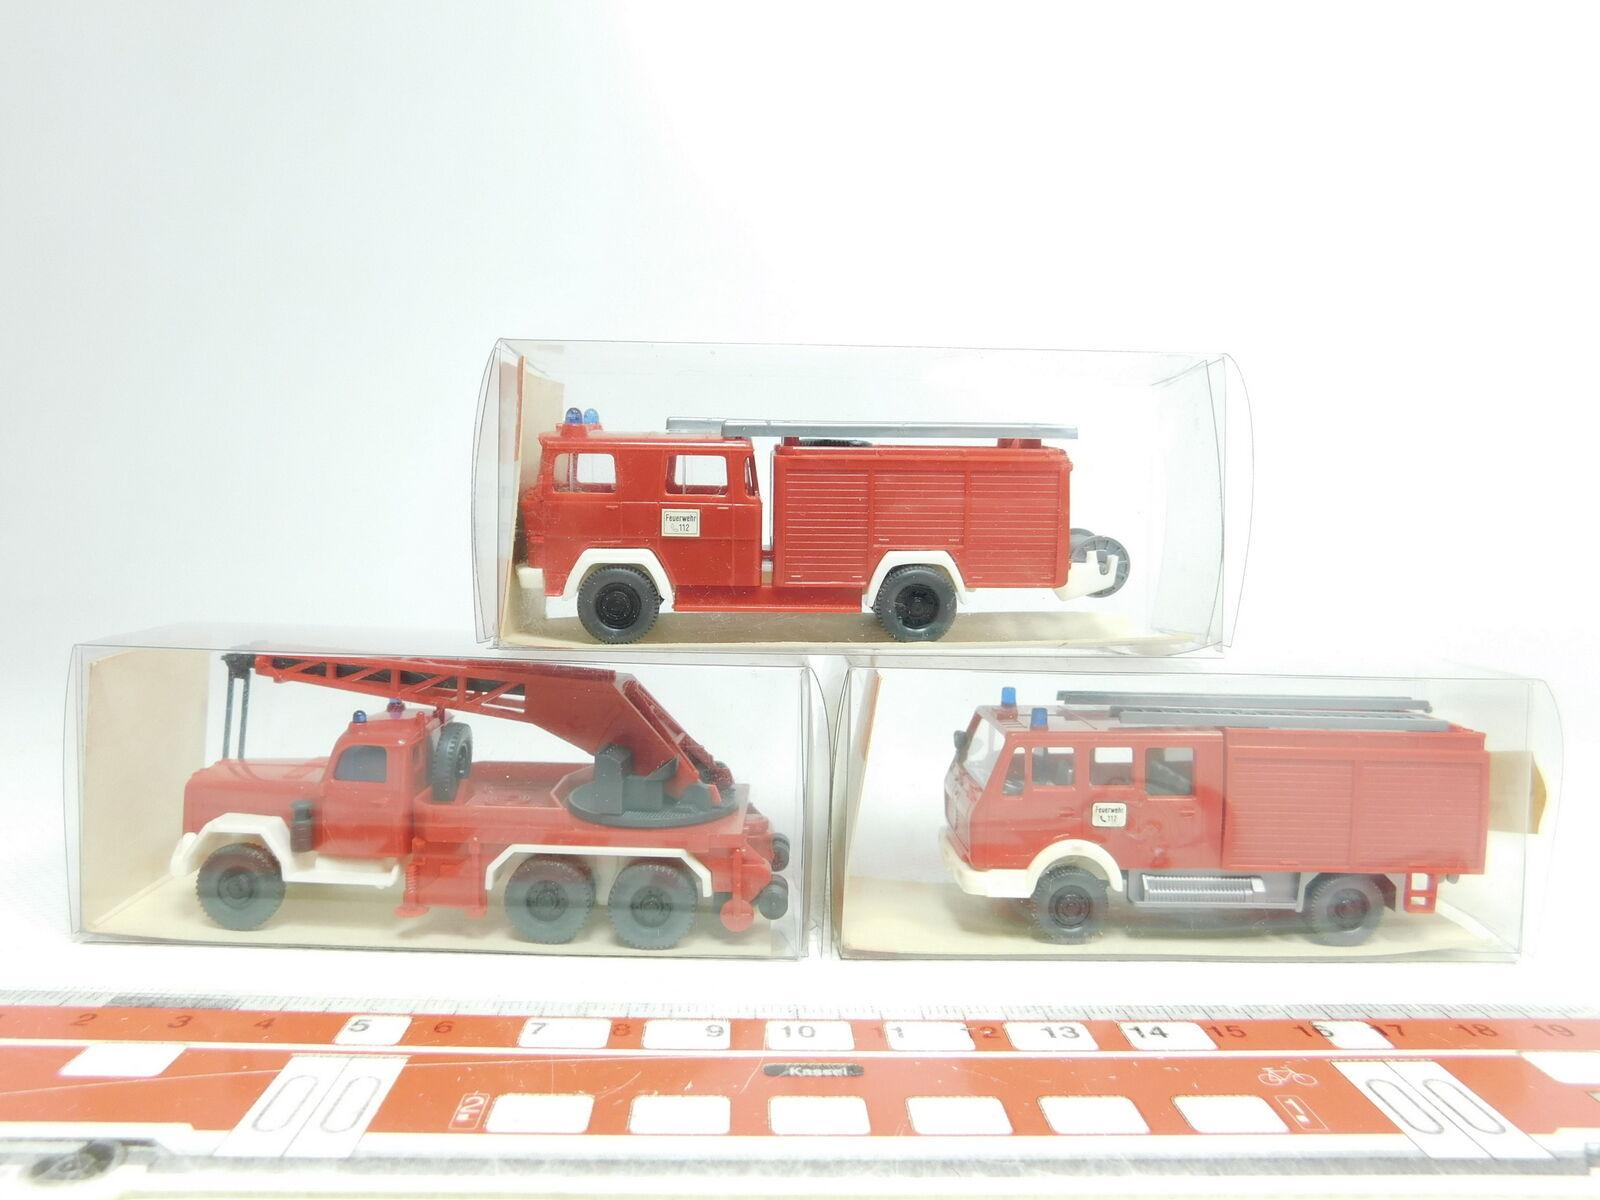 Bj470-0, 5 5 5  3x WIKING h0 1 87 Pompiers FW  630+610 MAGIRUS +616 Mercedes Neuw + neuf dans sa boîte 92eebc